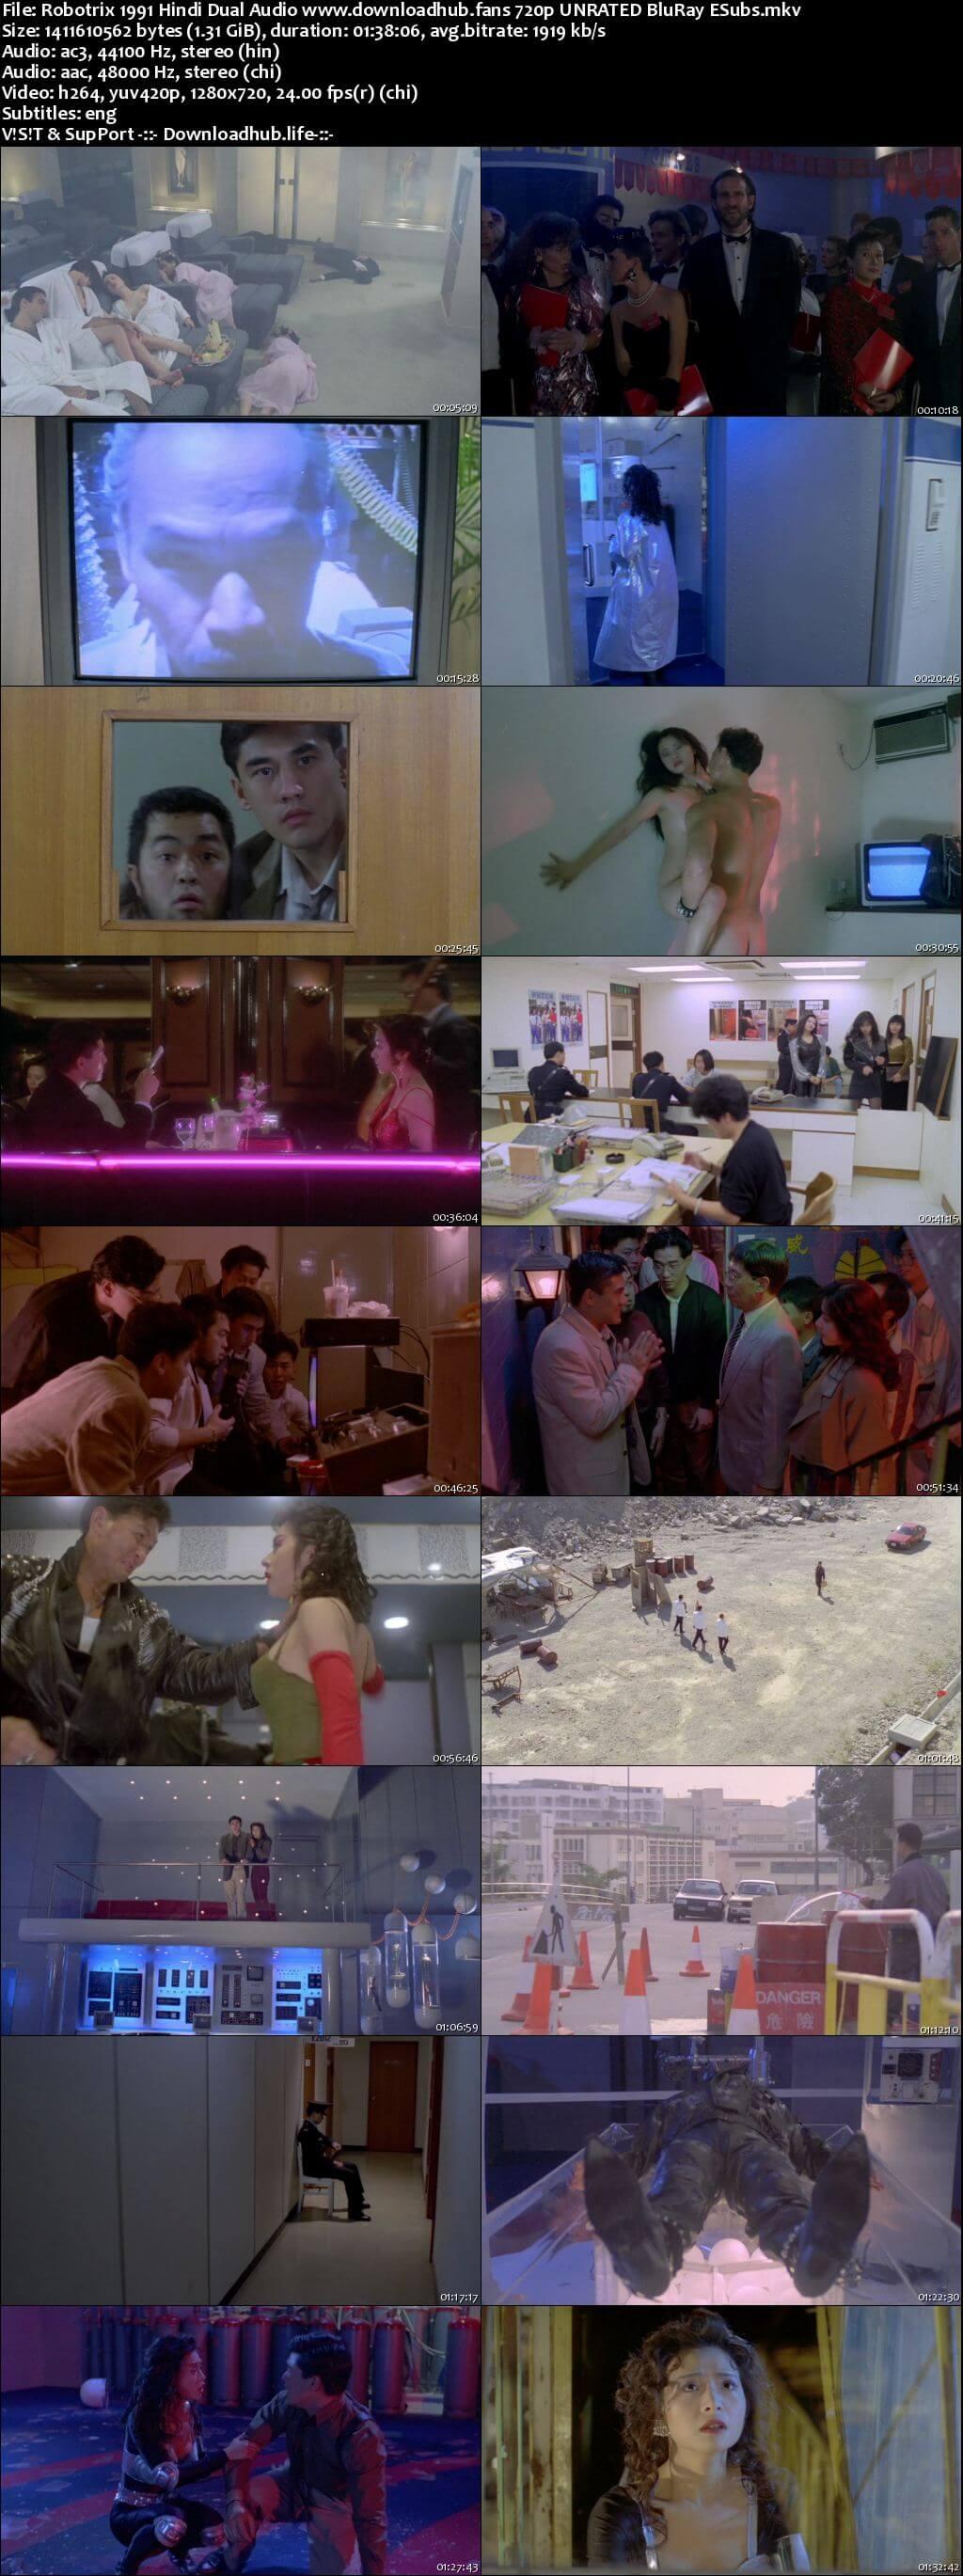 Robotrix 1991 Hindi Dual Audio 720p UNRATED BluRay ESubs